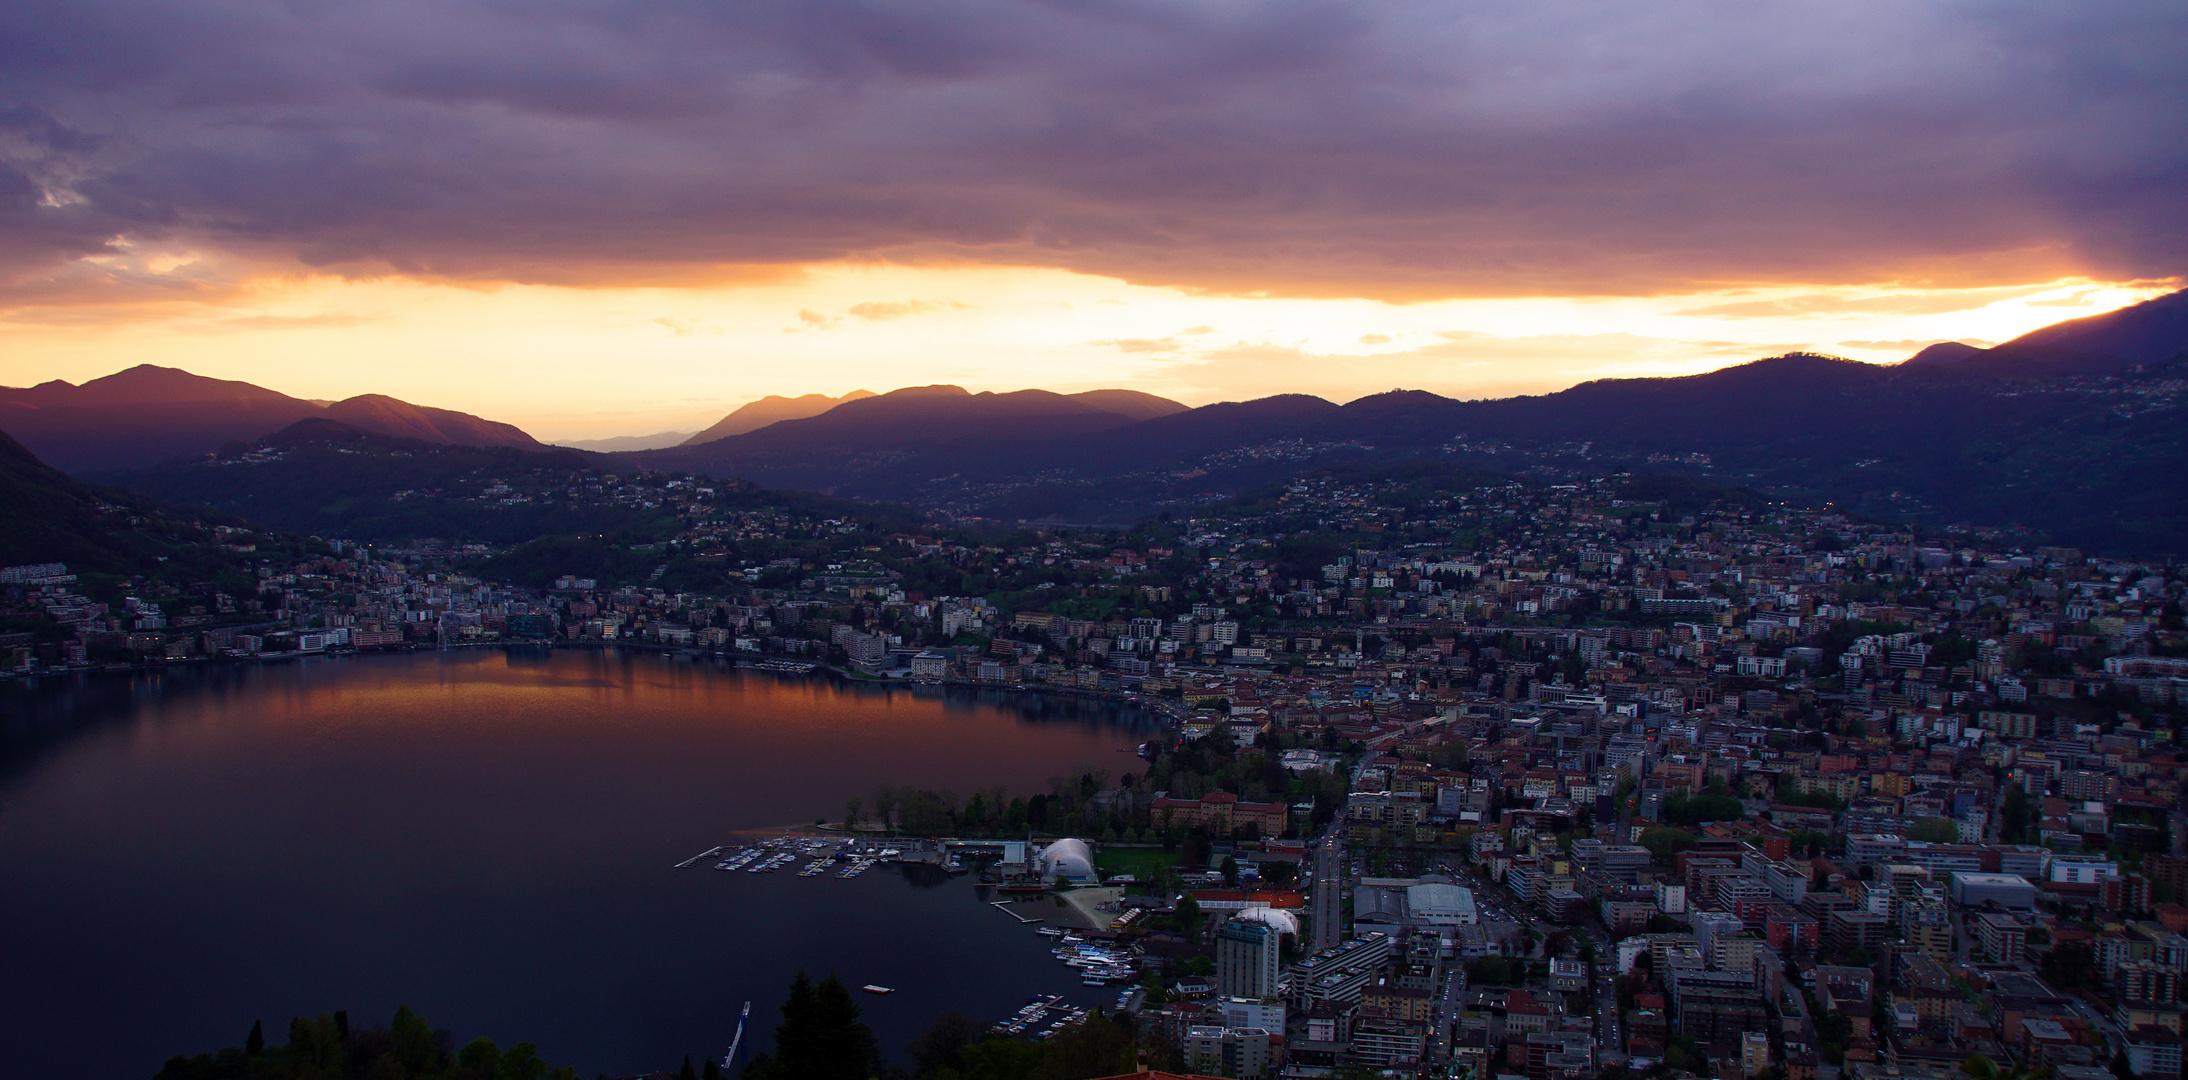 Sonnenuntergang in Lugano 1